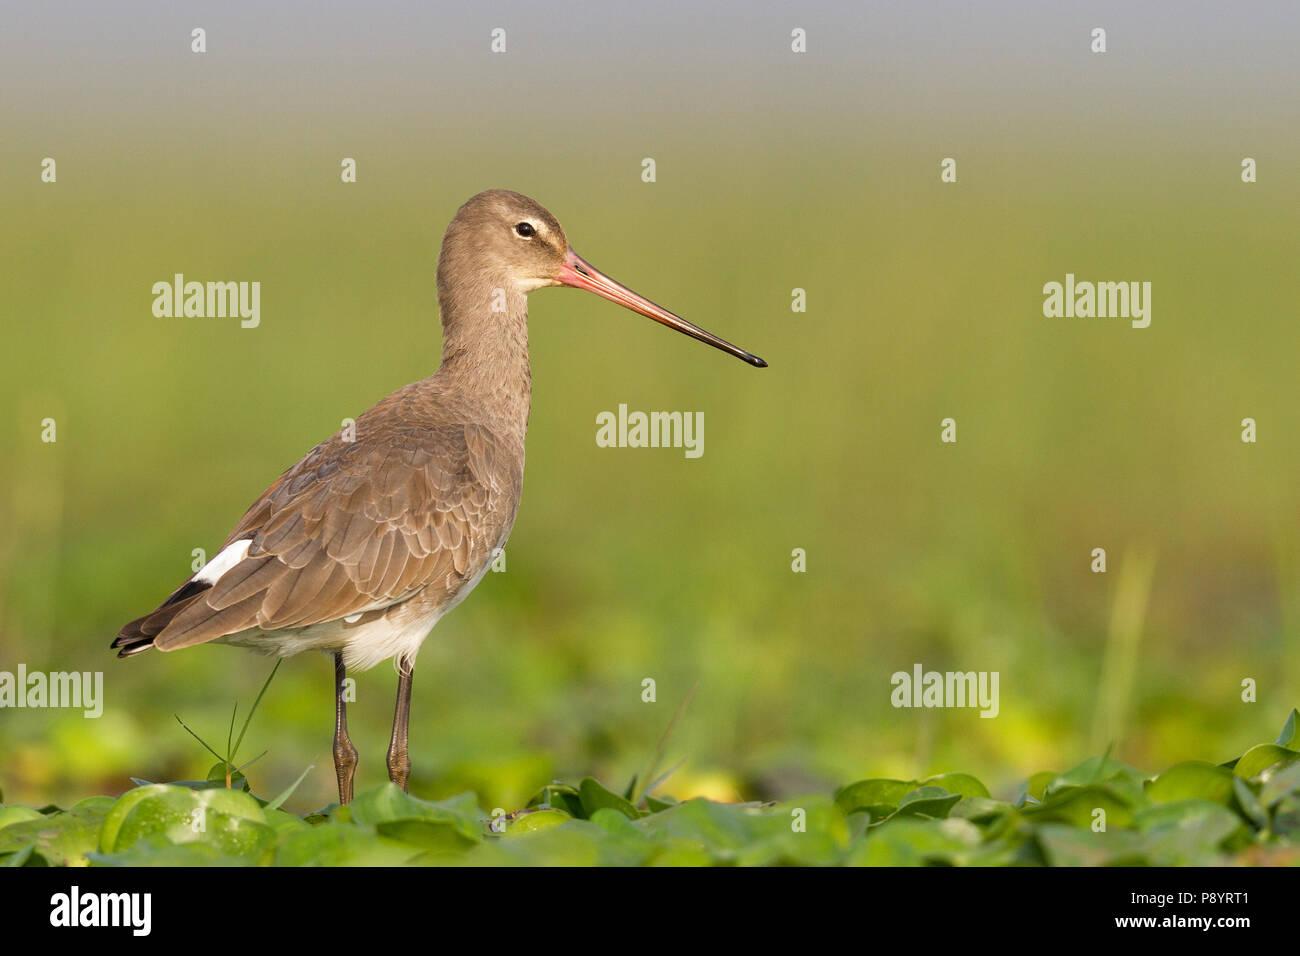 Black-tailed Godwit or Limosa limosa in Manglajodi wetlands Orissa India - Stock Image